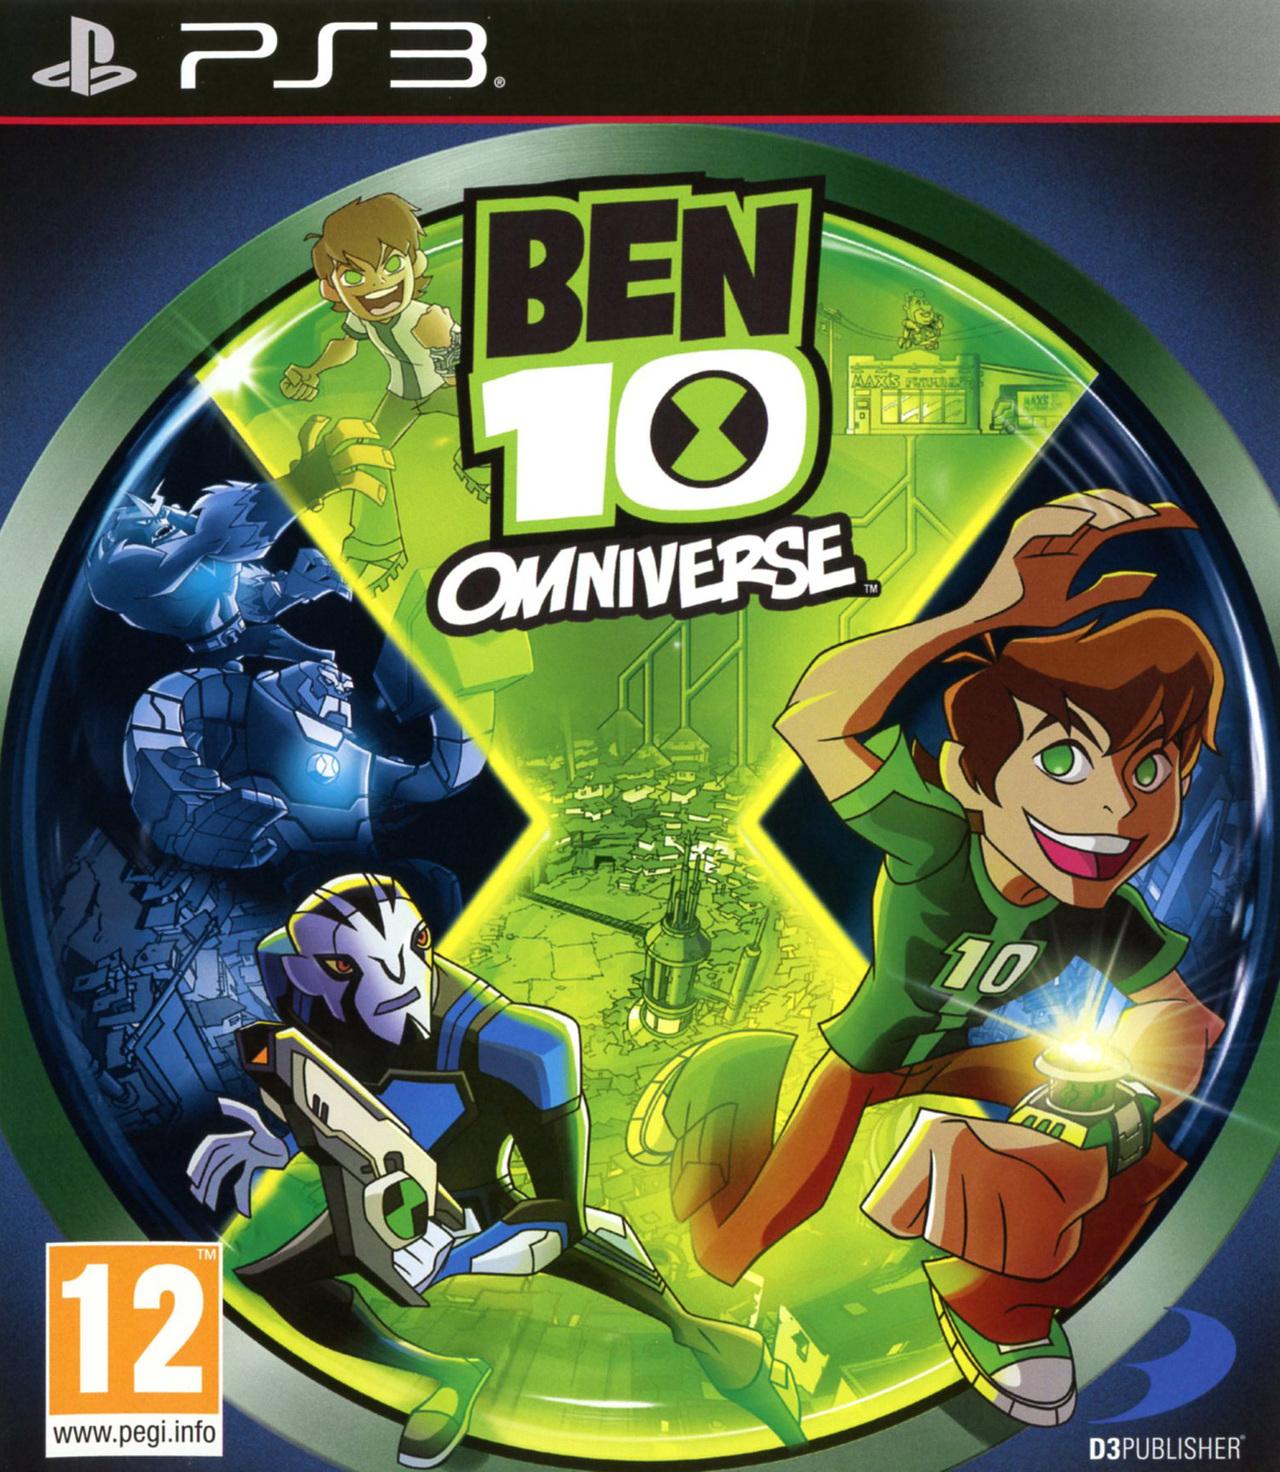 Ben 10 omniverse sur playstation 3 - Jeux ben 10 info ...